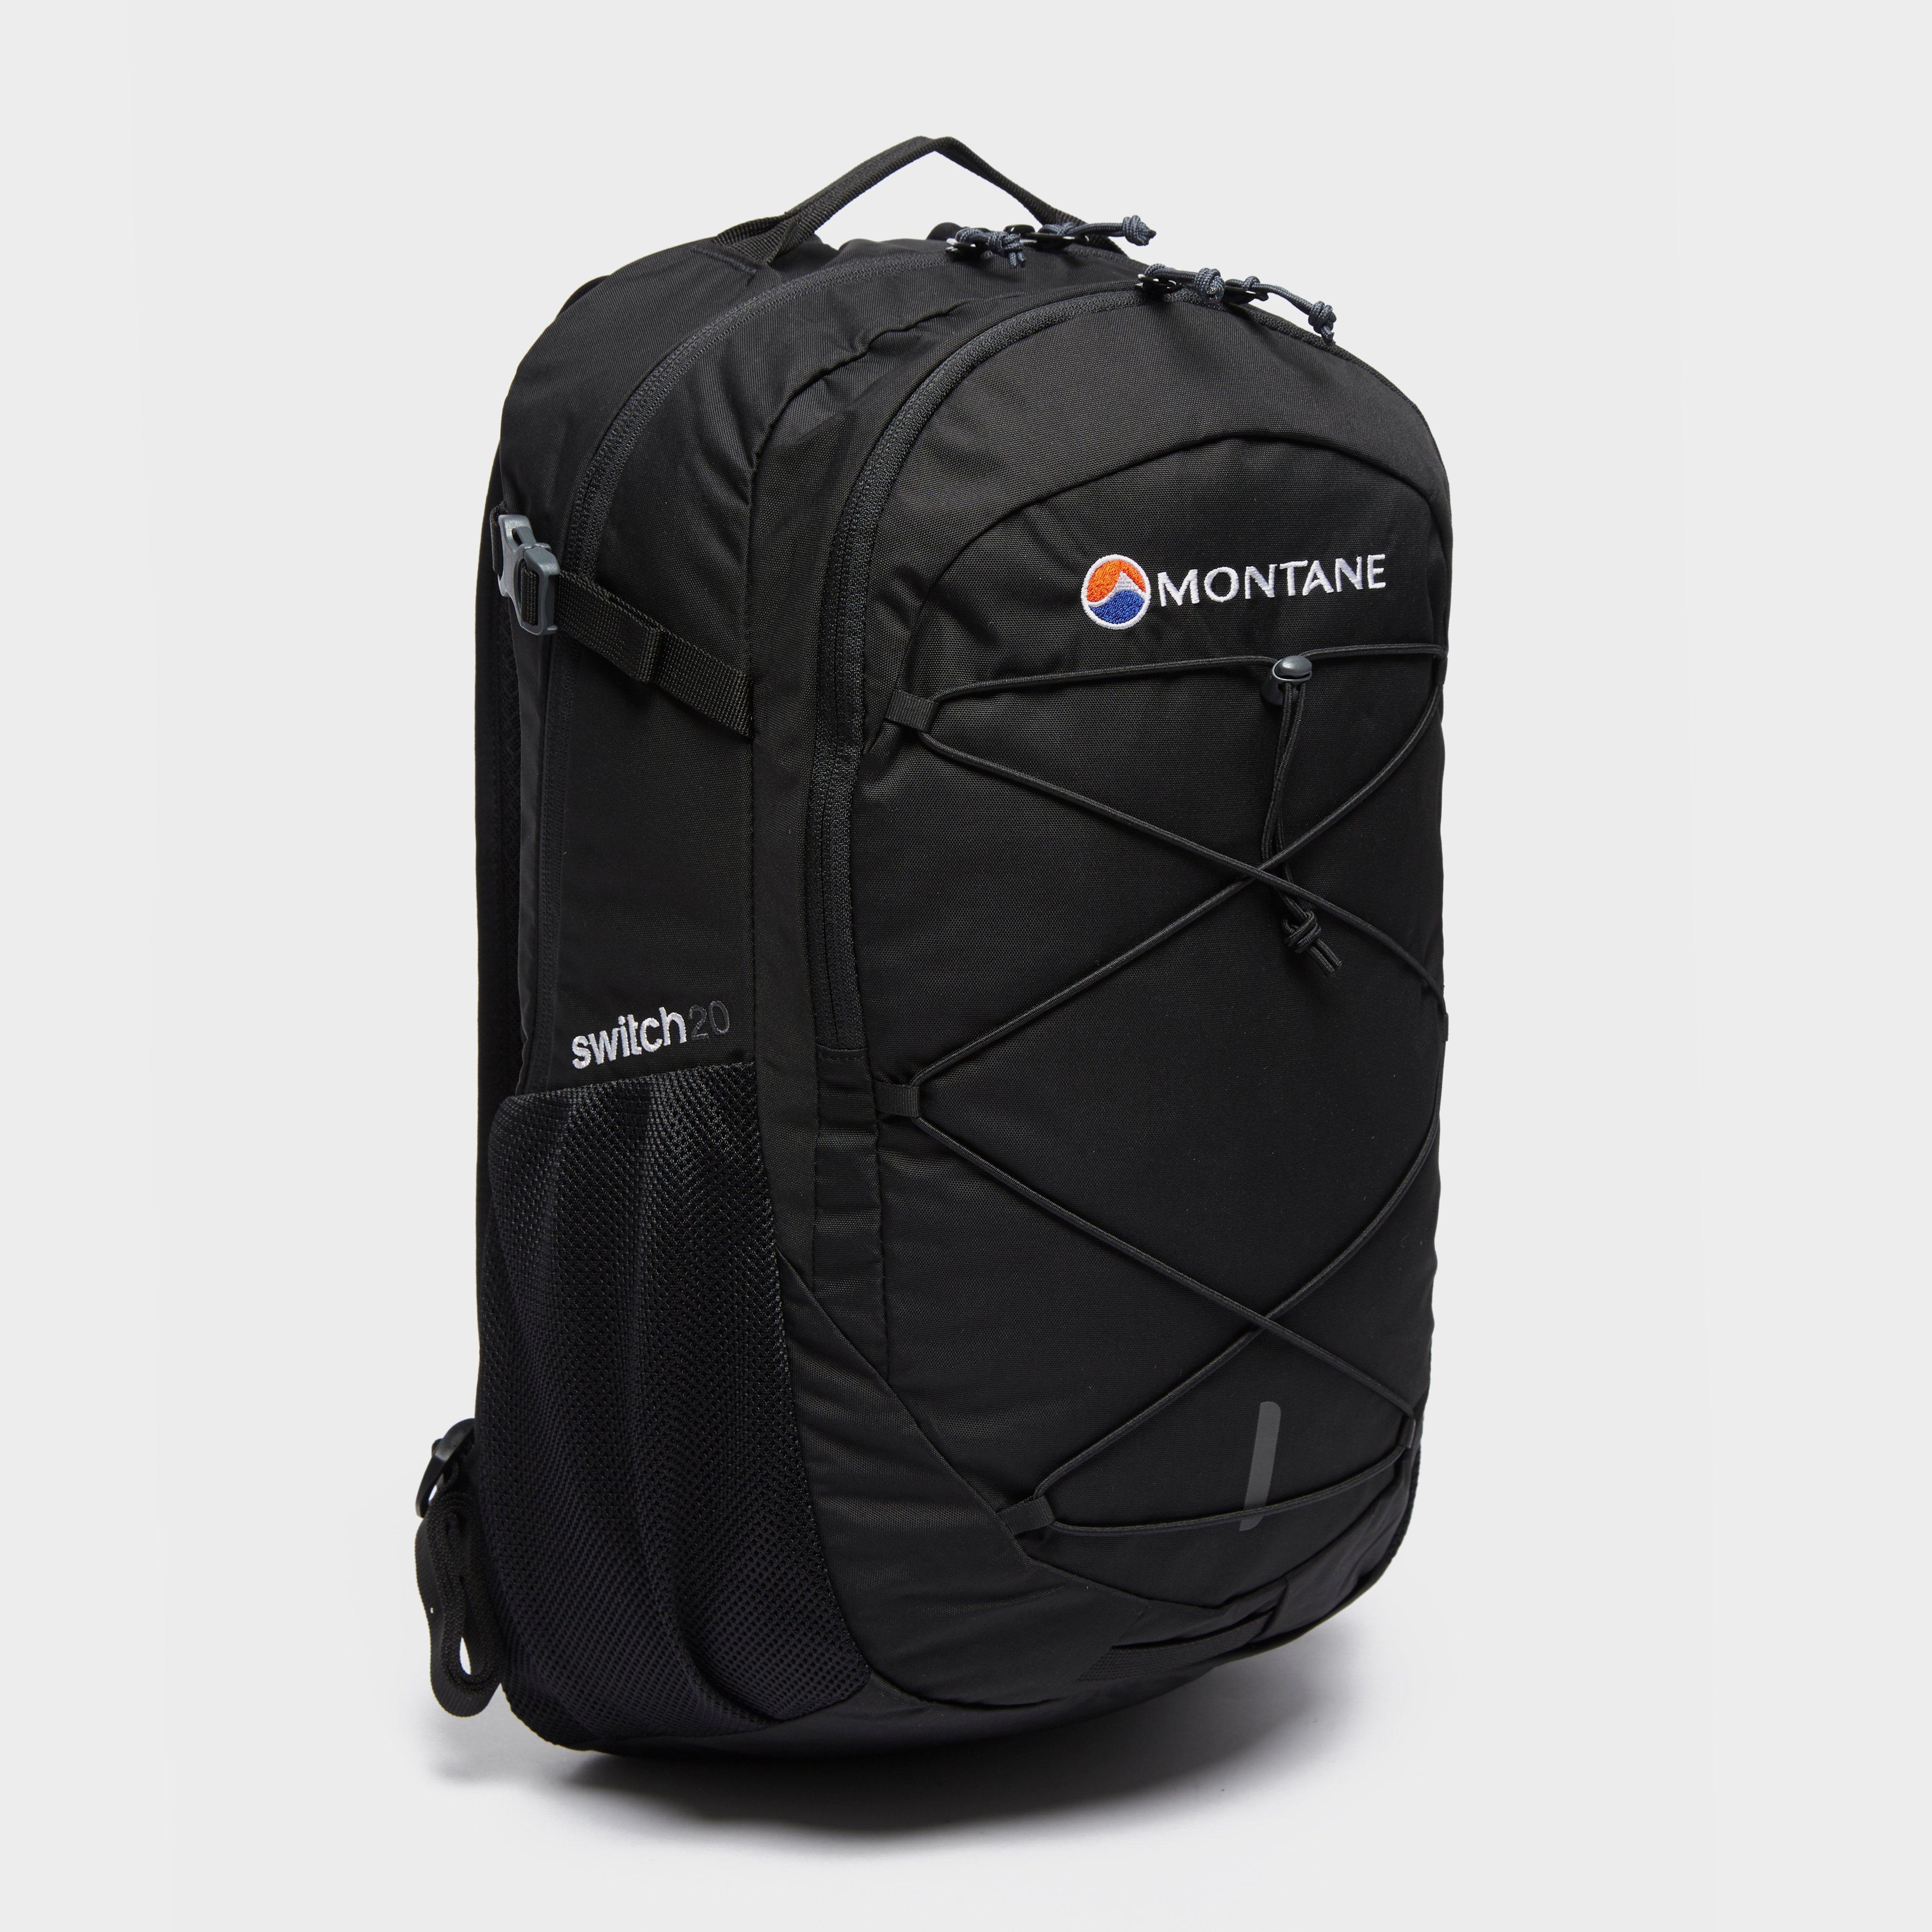 Montane Montane Switch 20 Daypack, Black